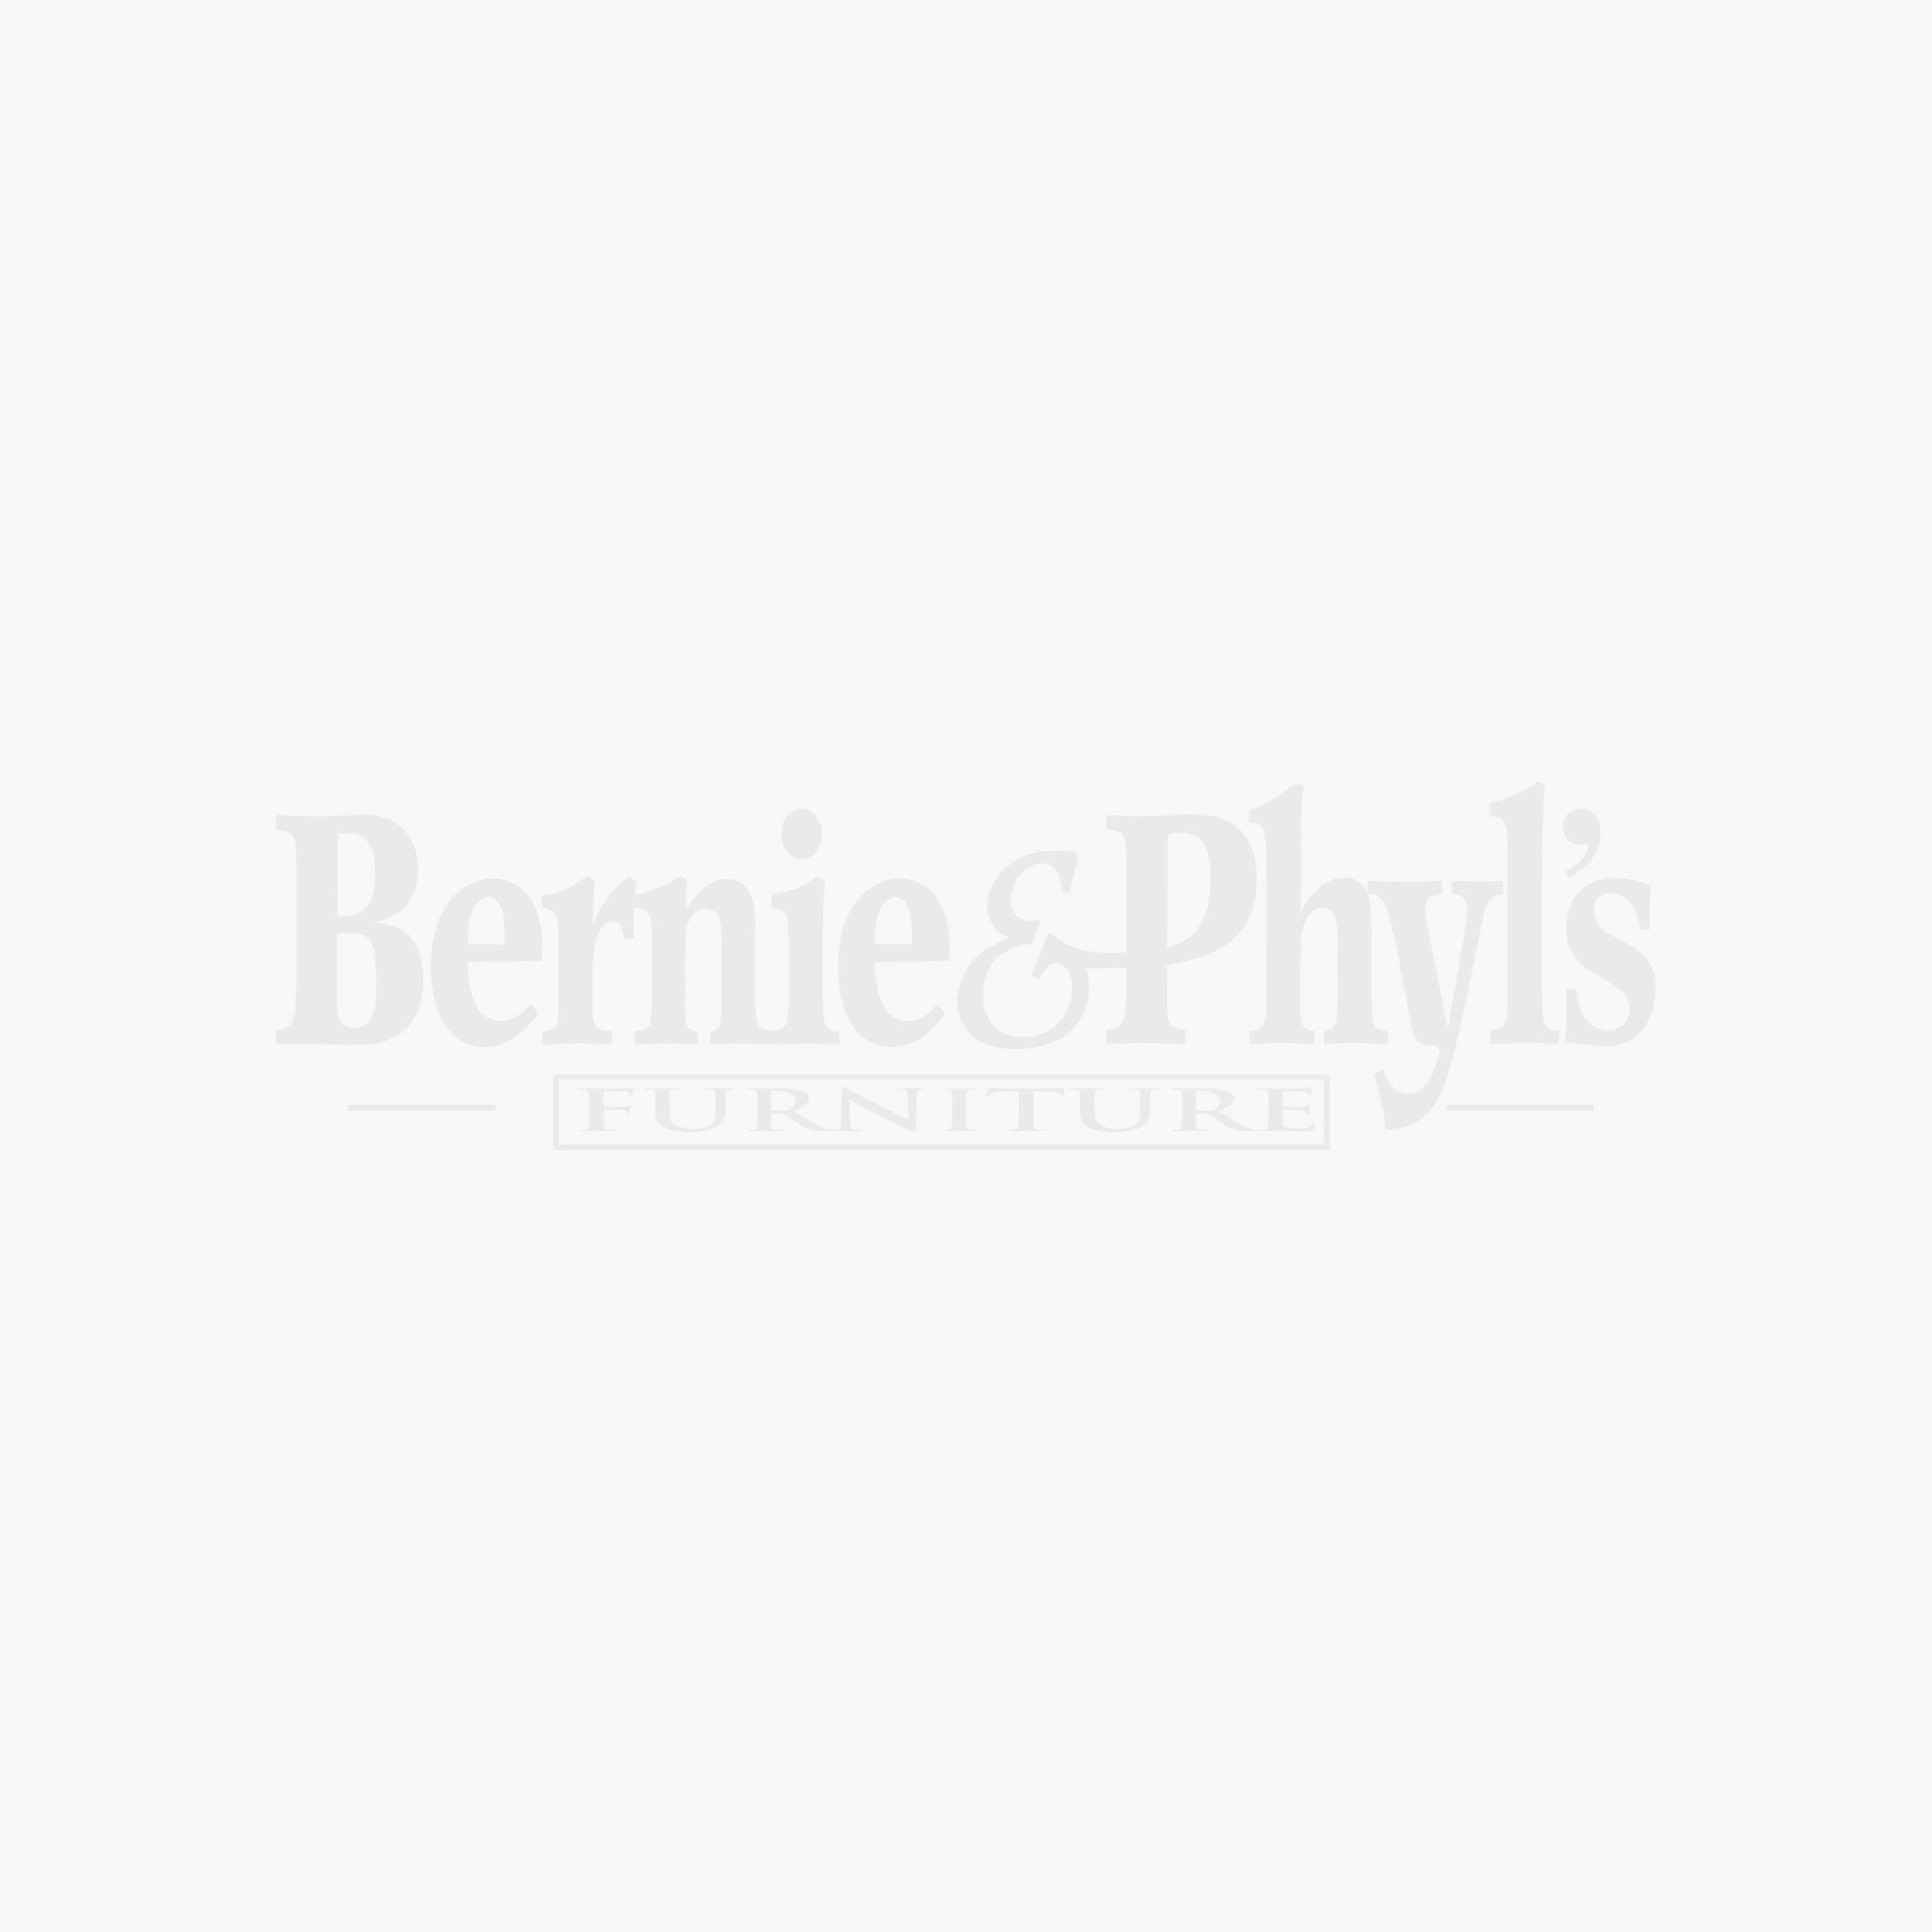 Beautiful Yosemite Rectangular Table   Bernie U0026 Phylu0027s Furniture   By Modus Furniture  International